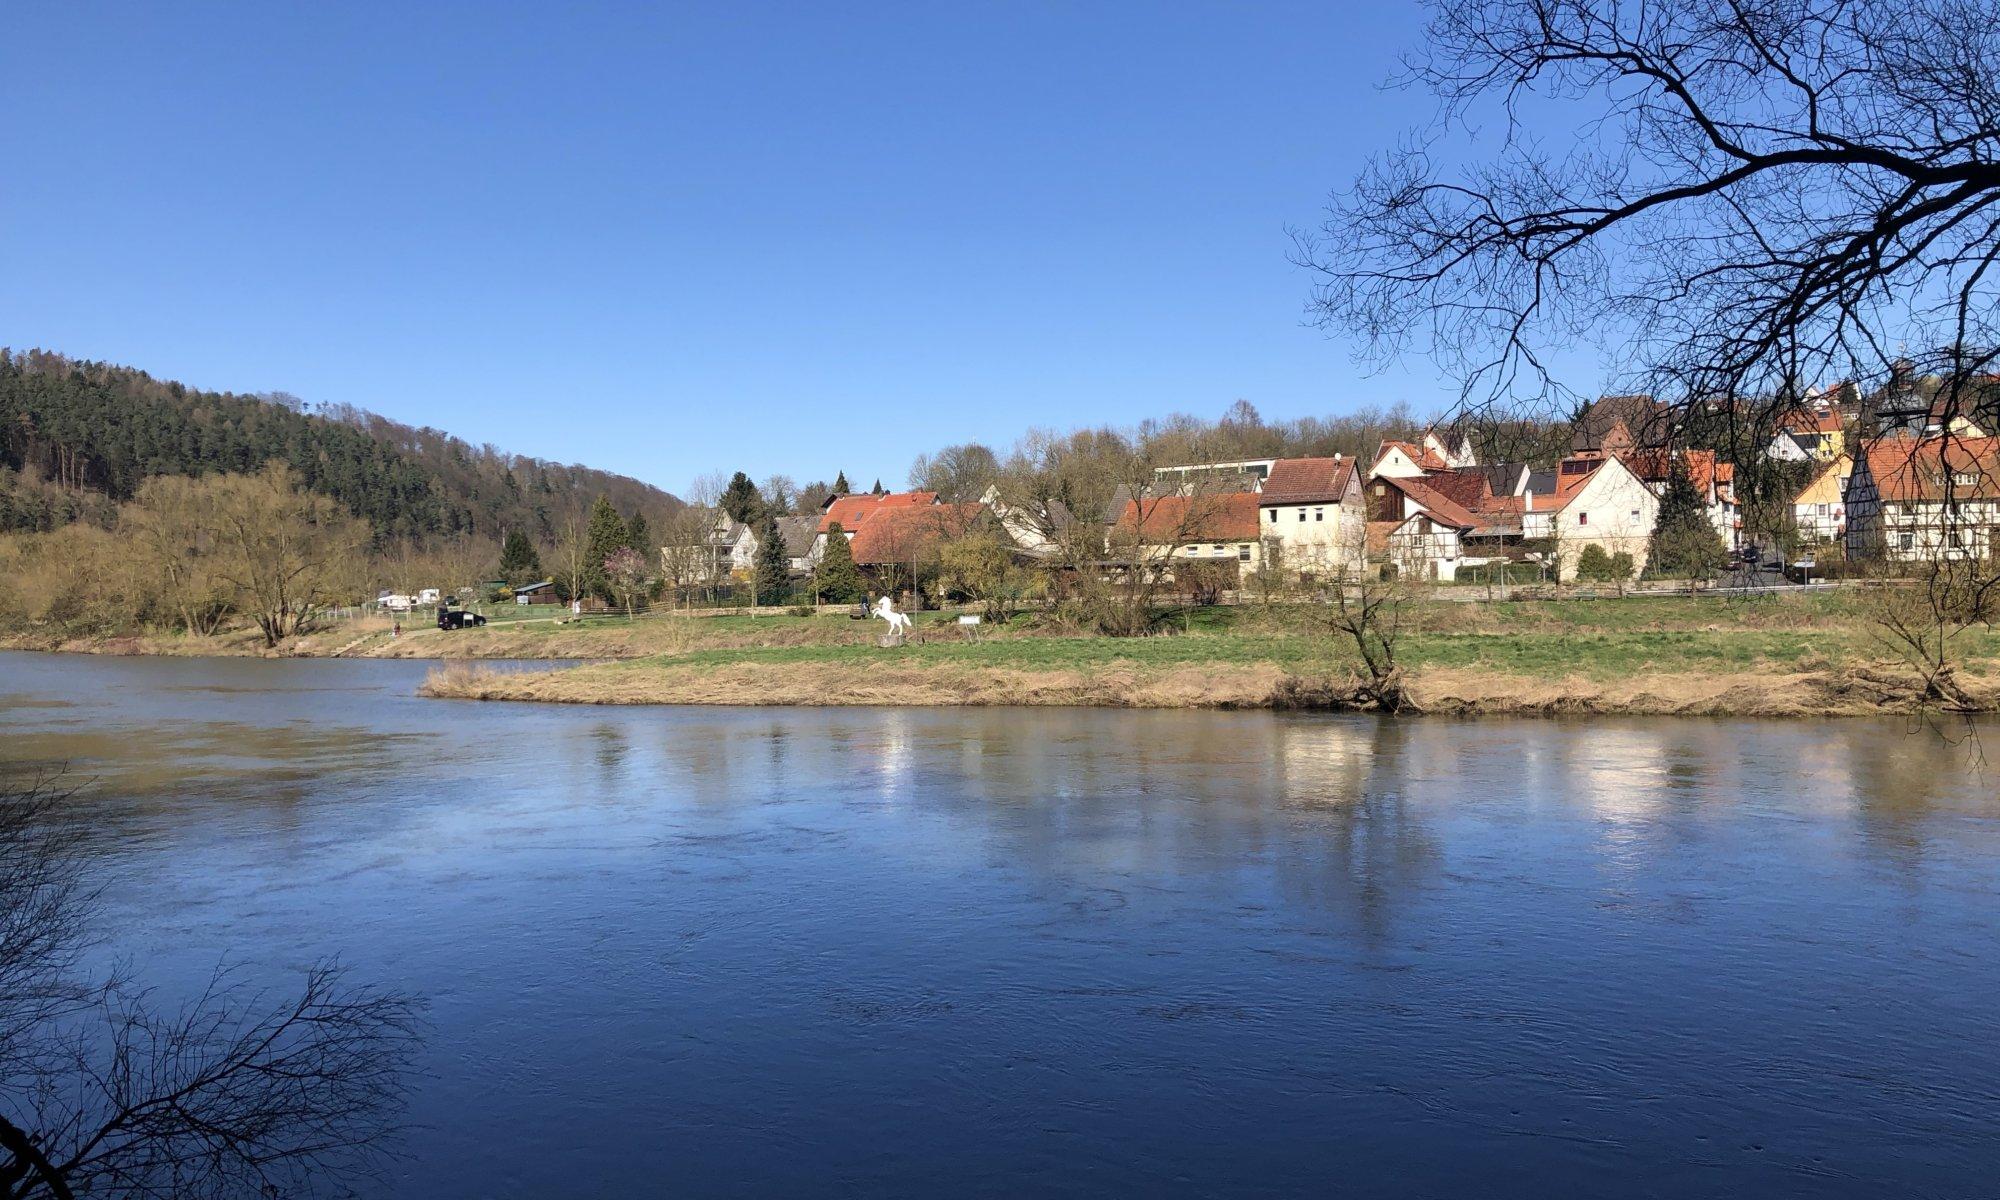 Niedersachsen-Eck, Staufenberg-Speele, Germany